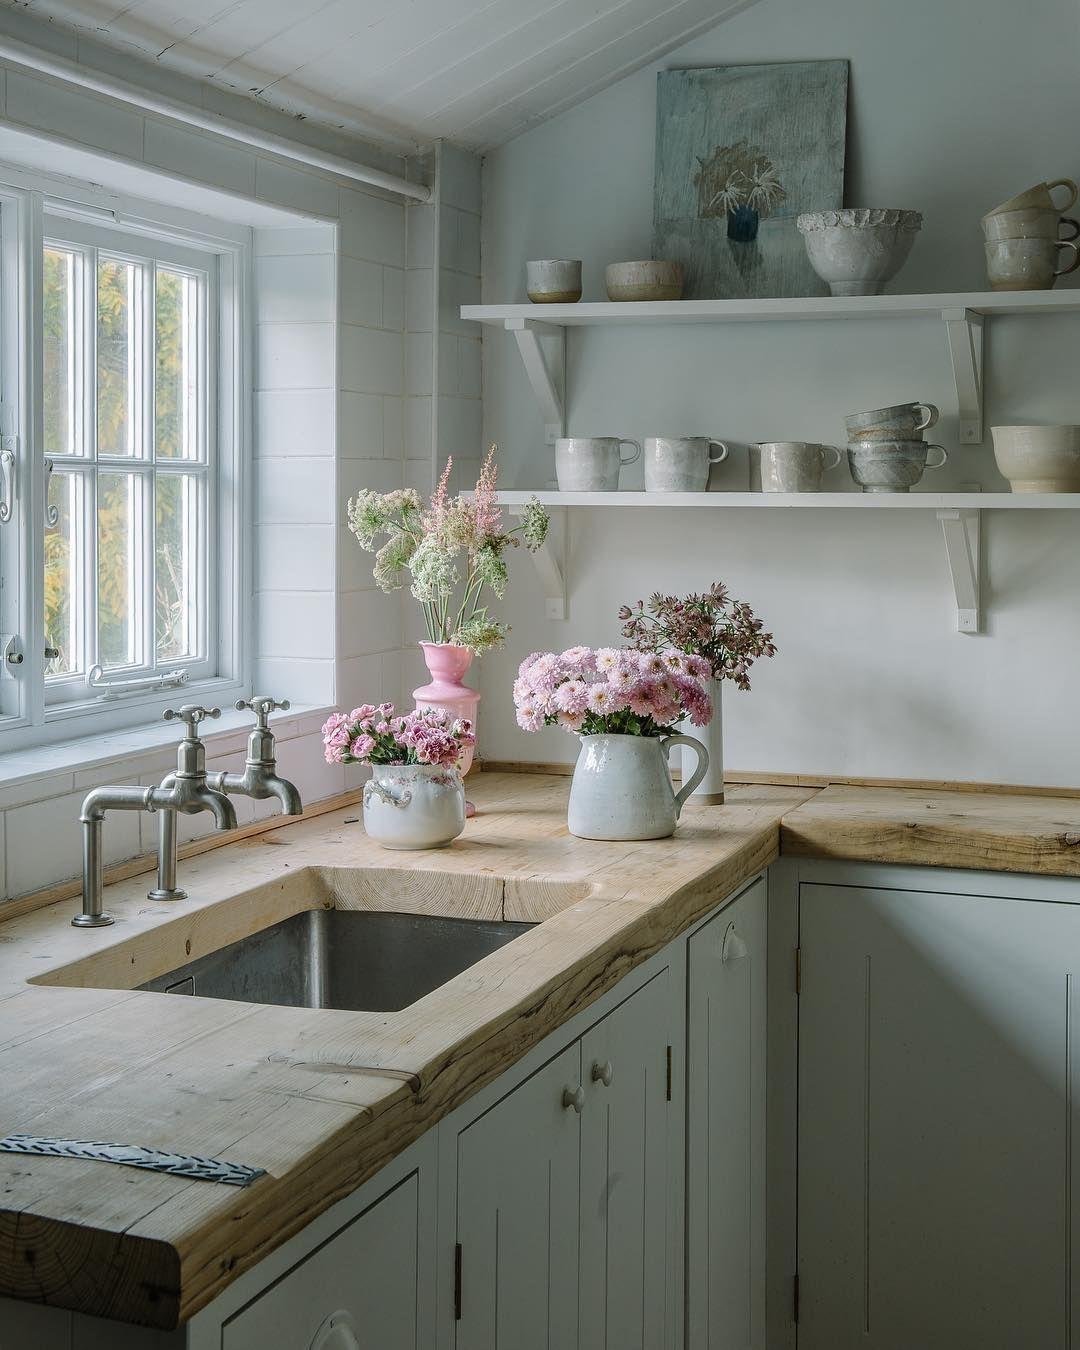 33 Modern Style Cozy Wooden Kitchen Design Ideas: 32 Genius Farmhouse Kitchen Decoration To Be Inspire (With